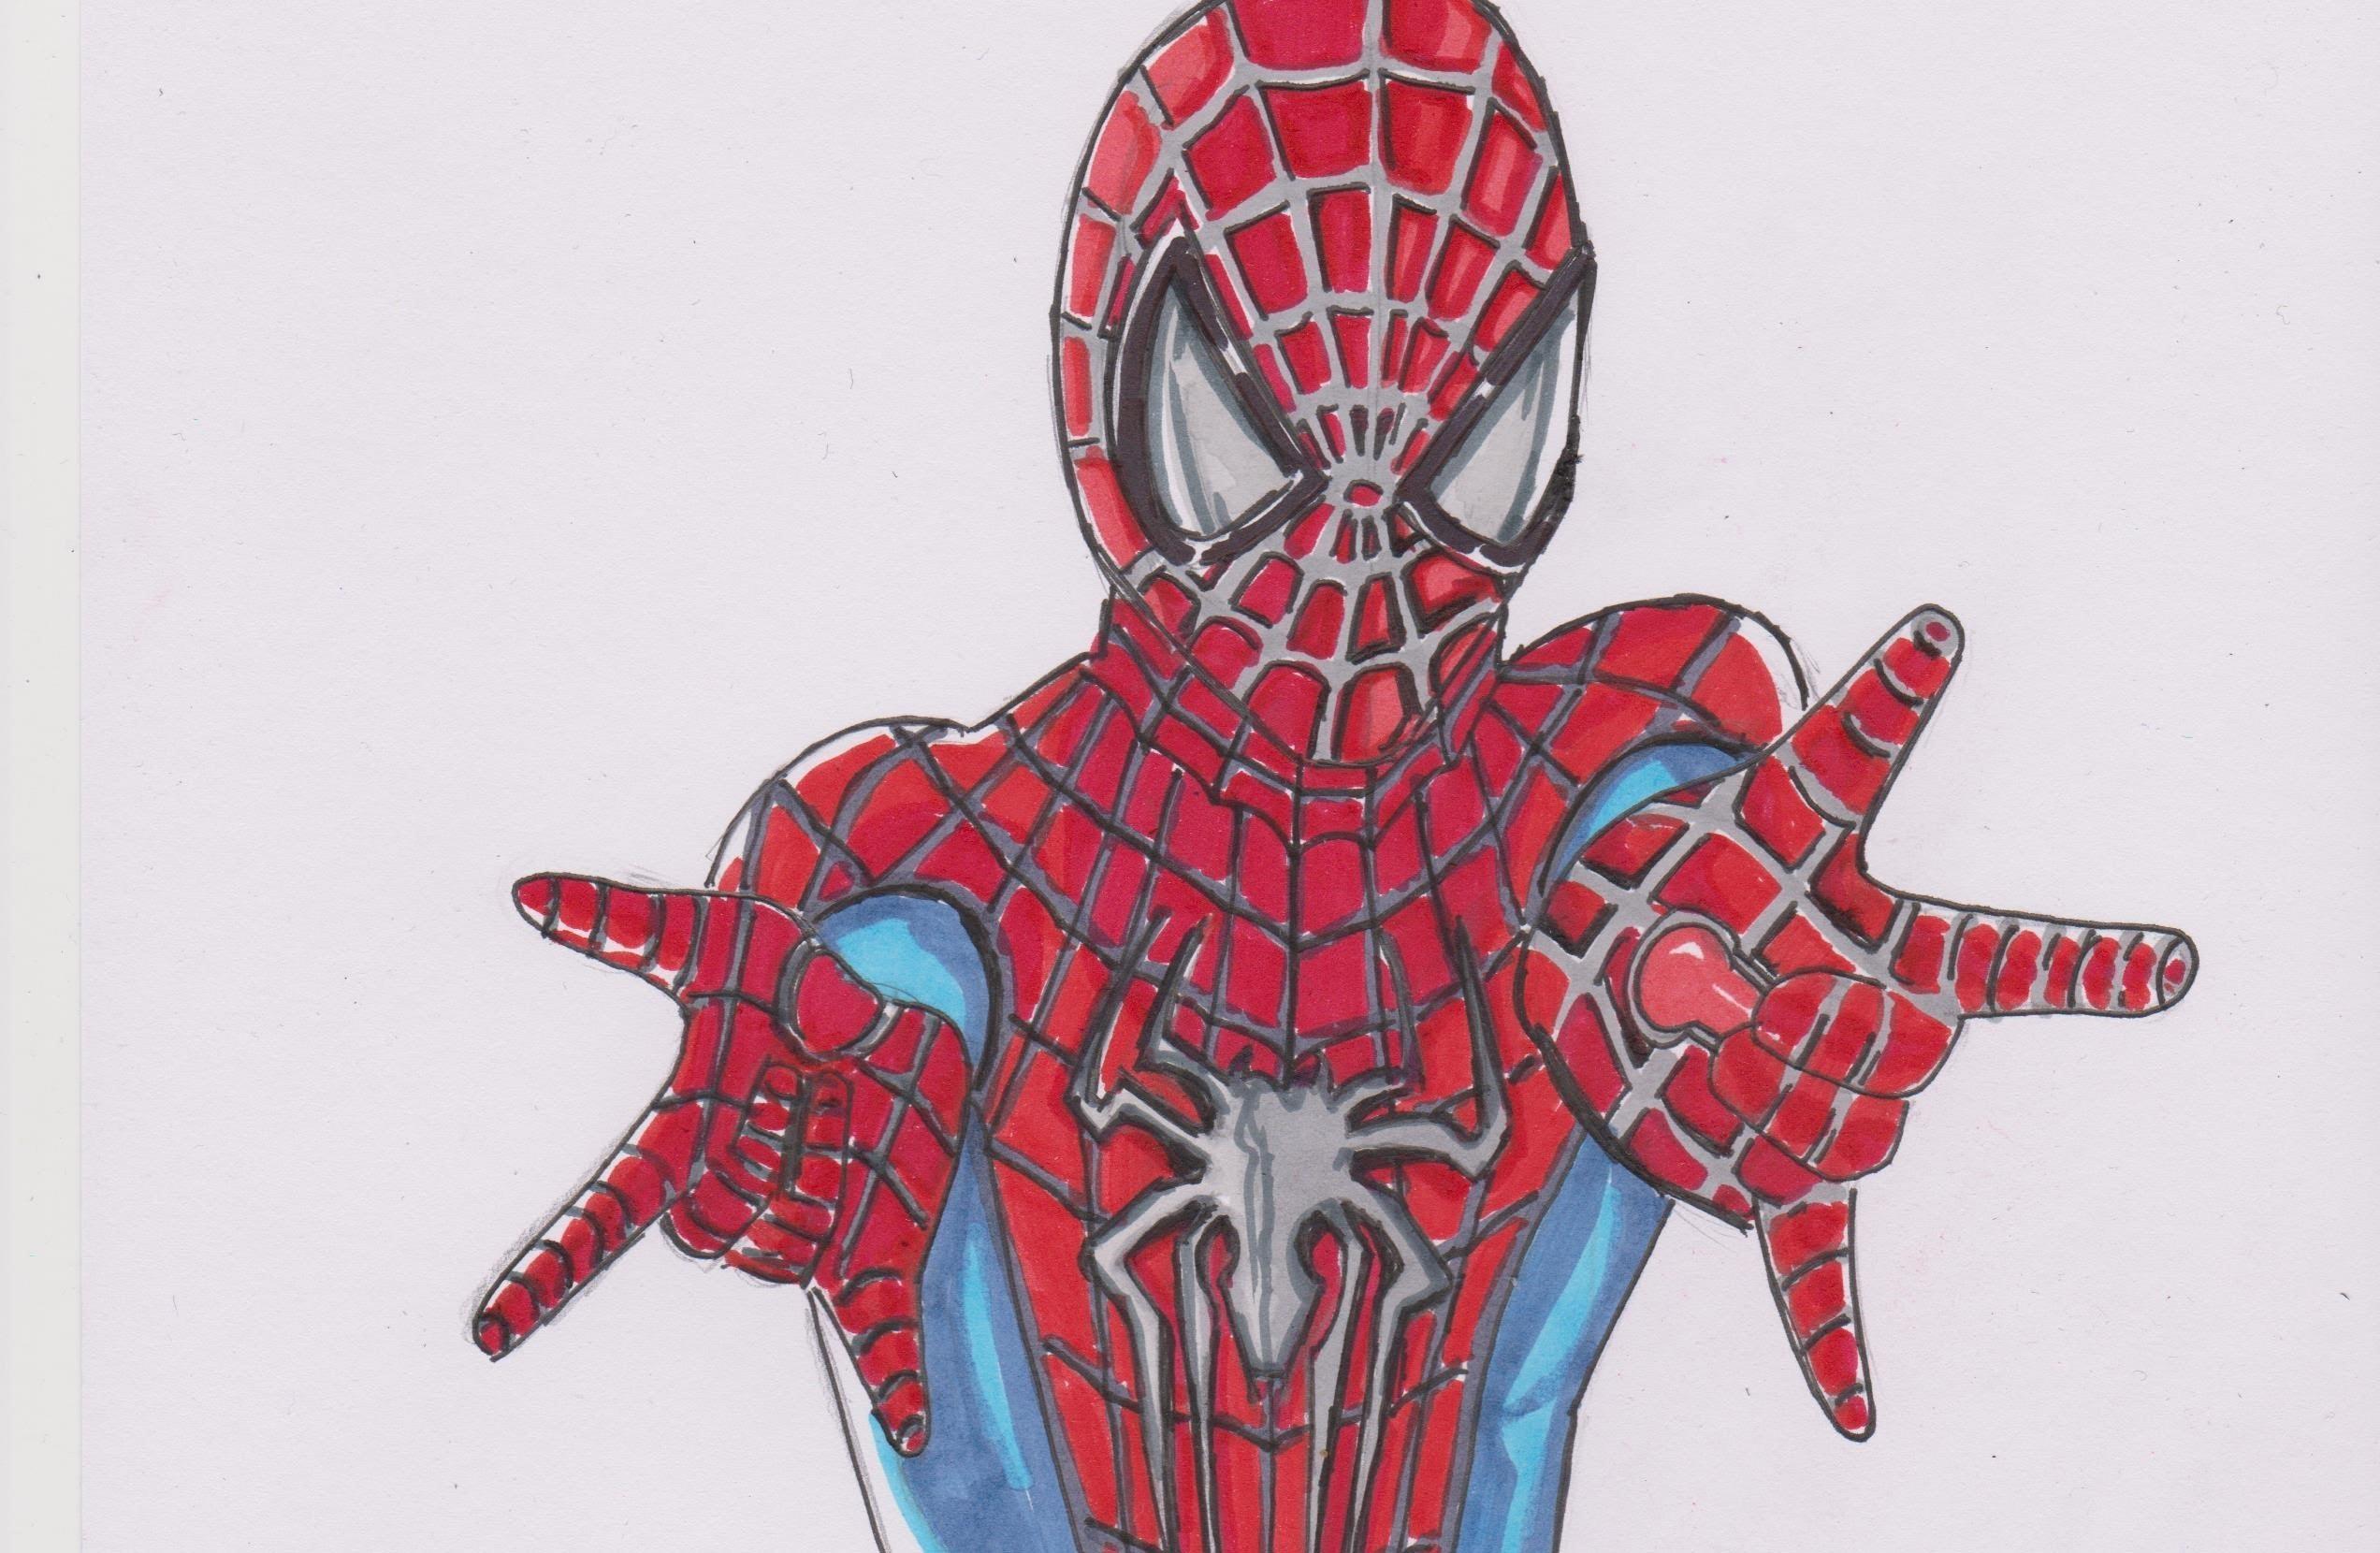 2544x1660 The Amazing Spider Man 2